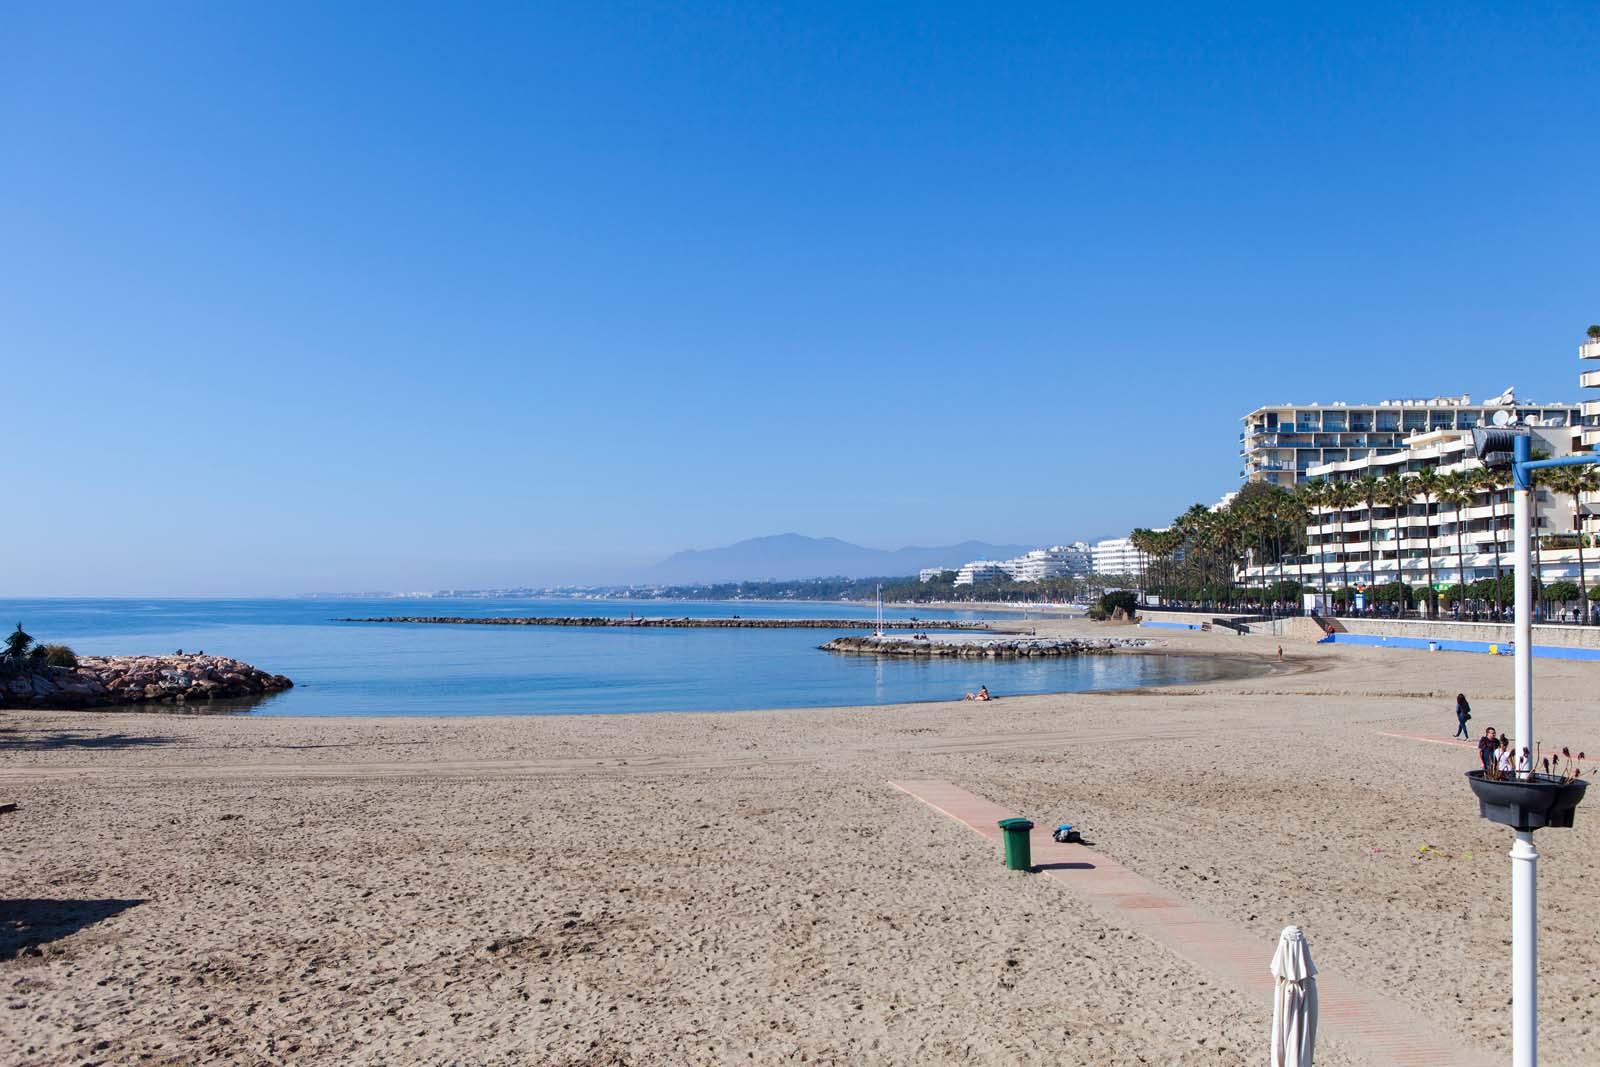 Skandiam klarna select boardwalk marbella city - Boardwalk marbella ...